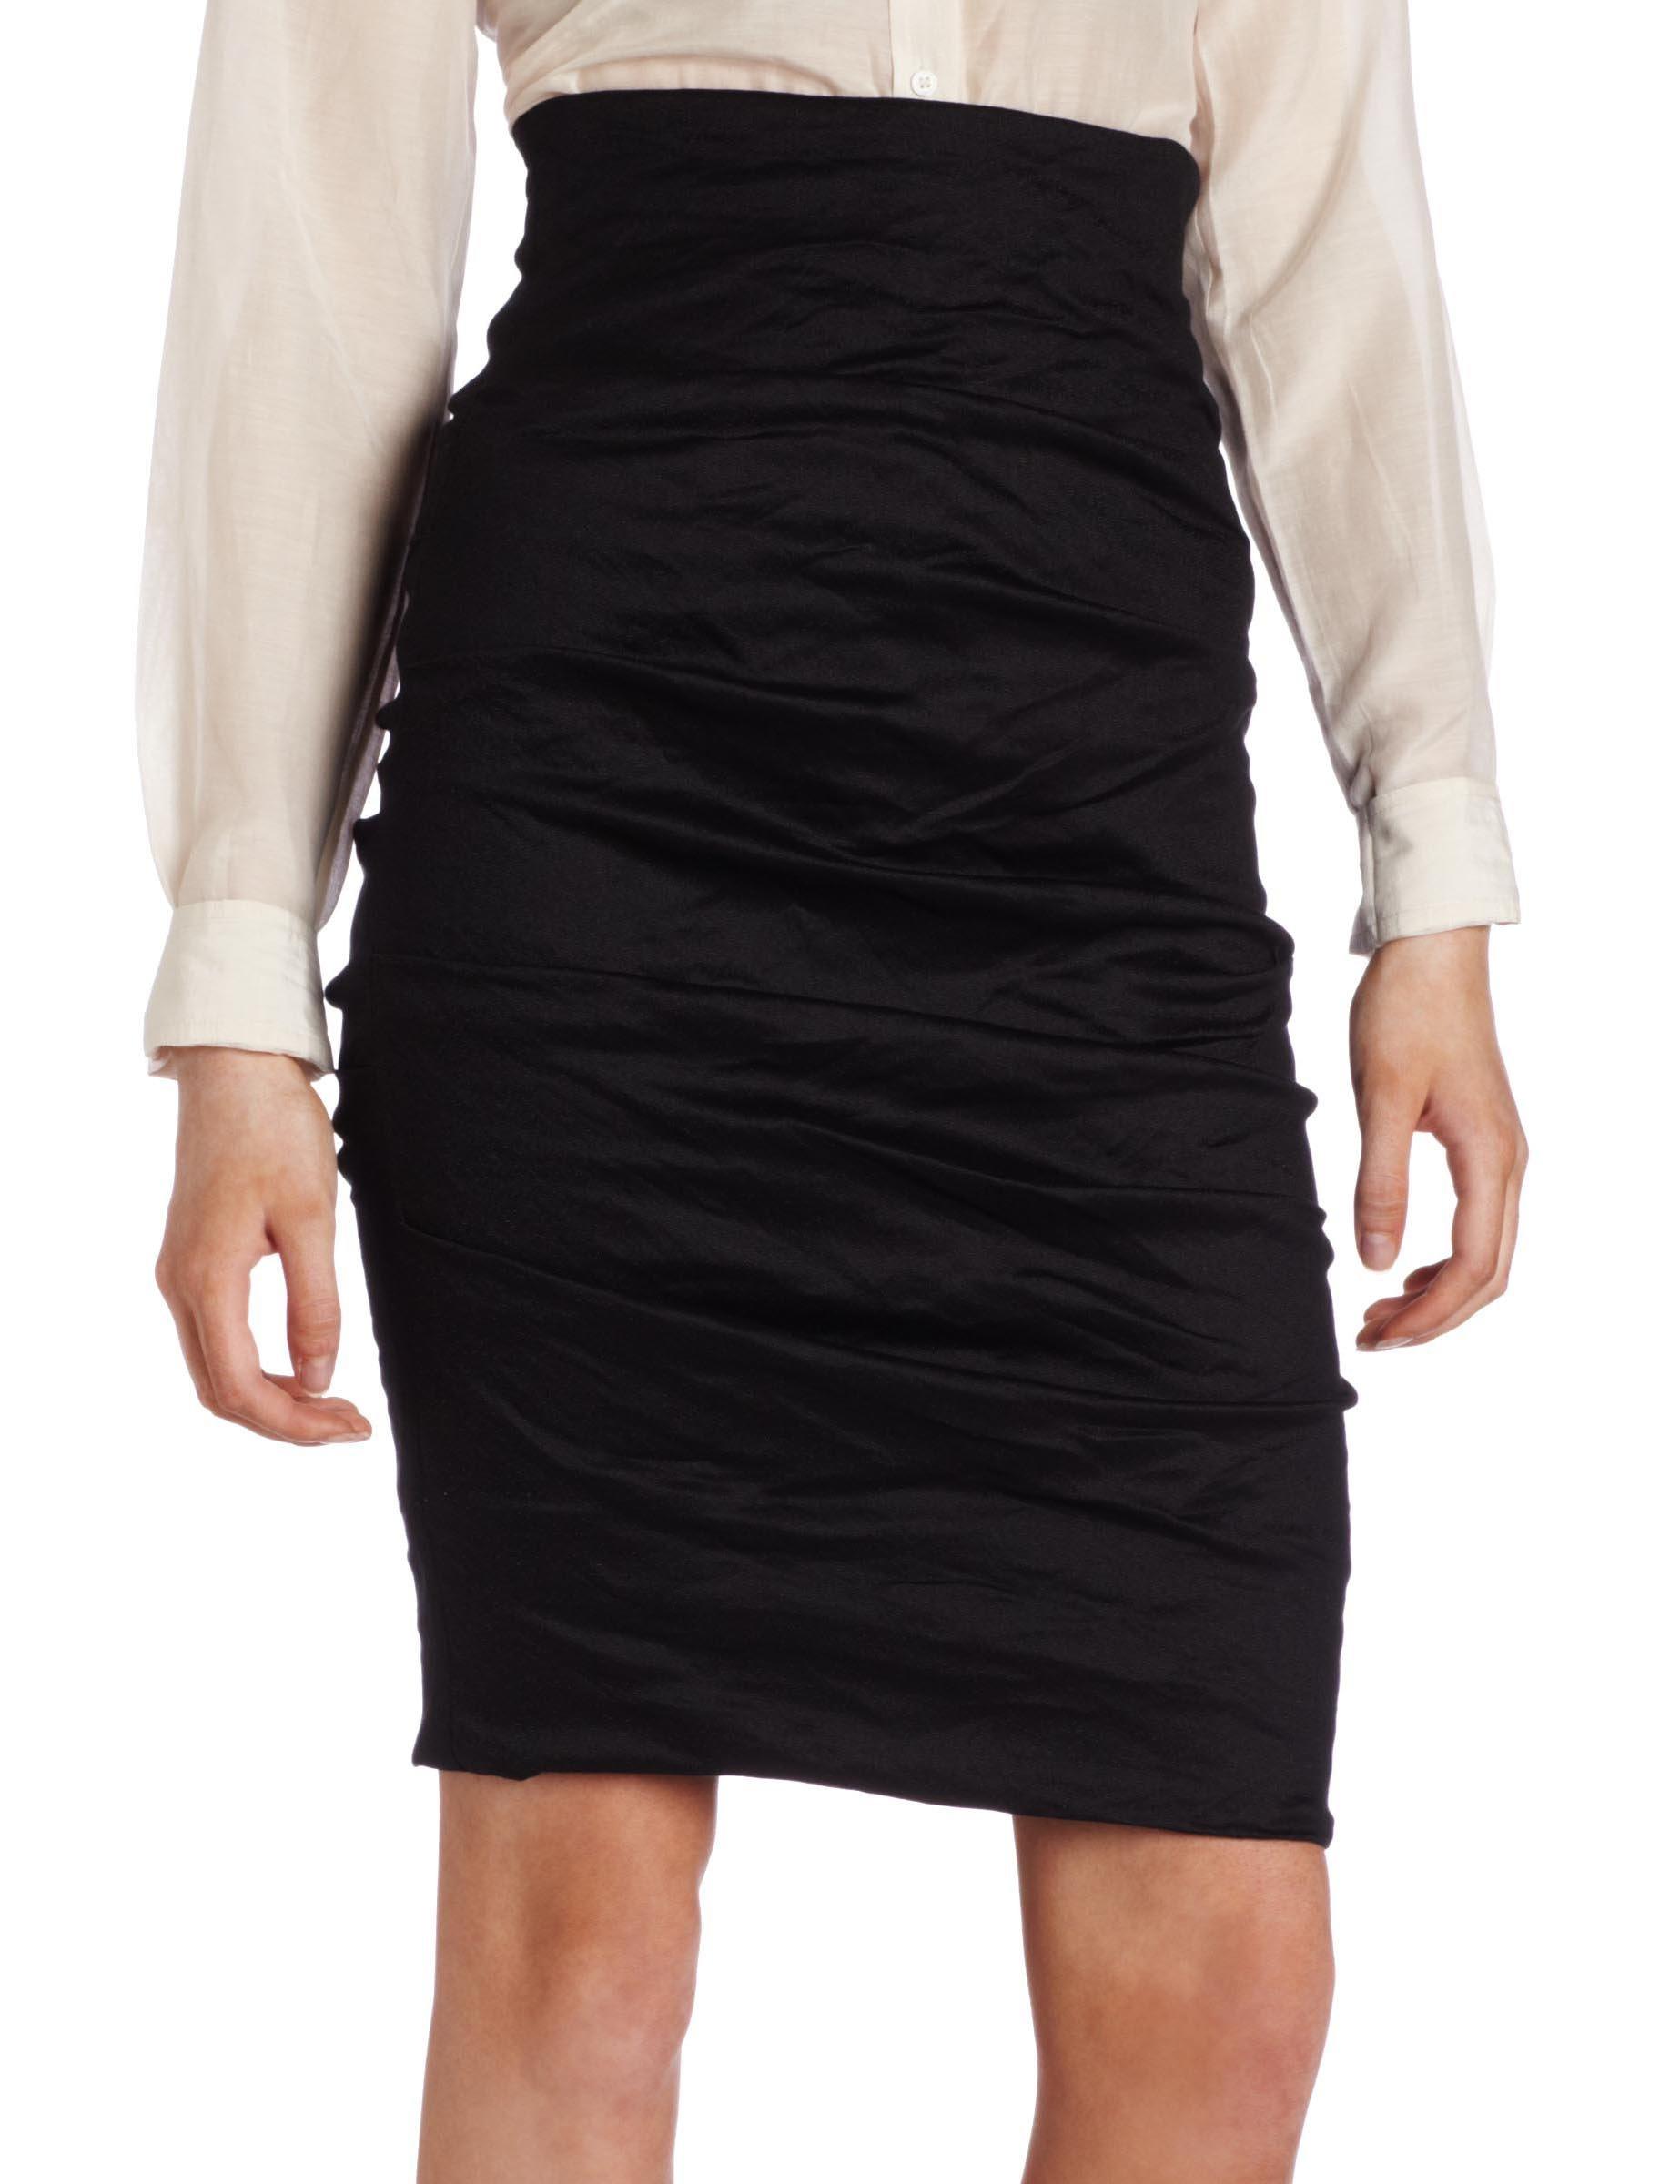 Nicole Miller Women's ''Sandy'' Cotton Metal Skirt Skirt, -black, 0